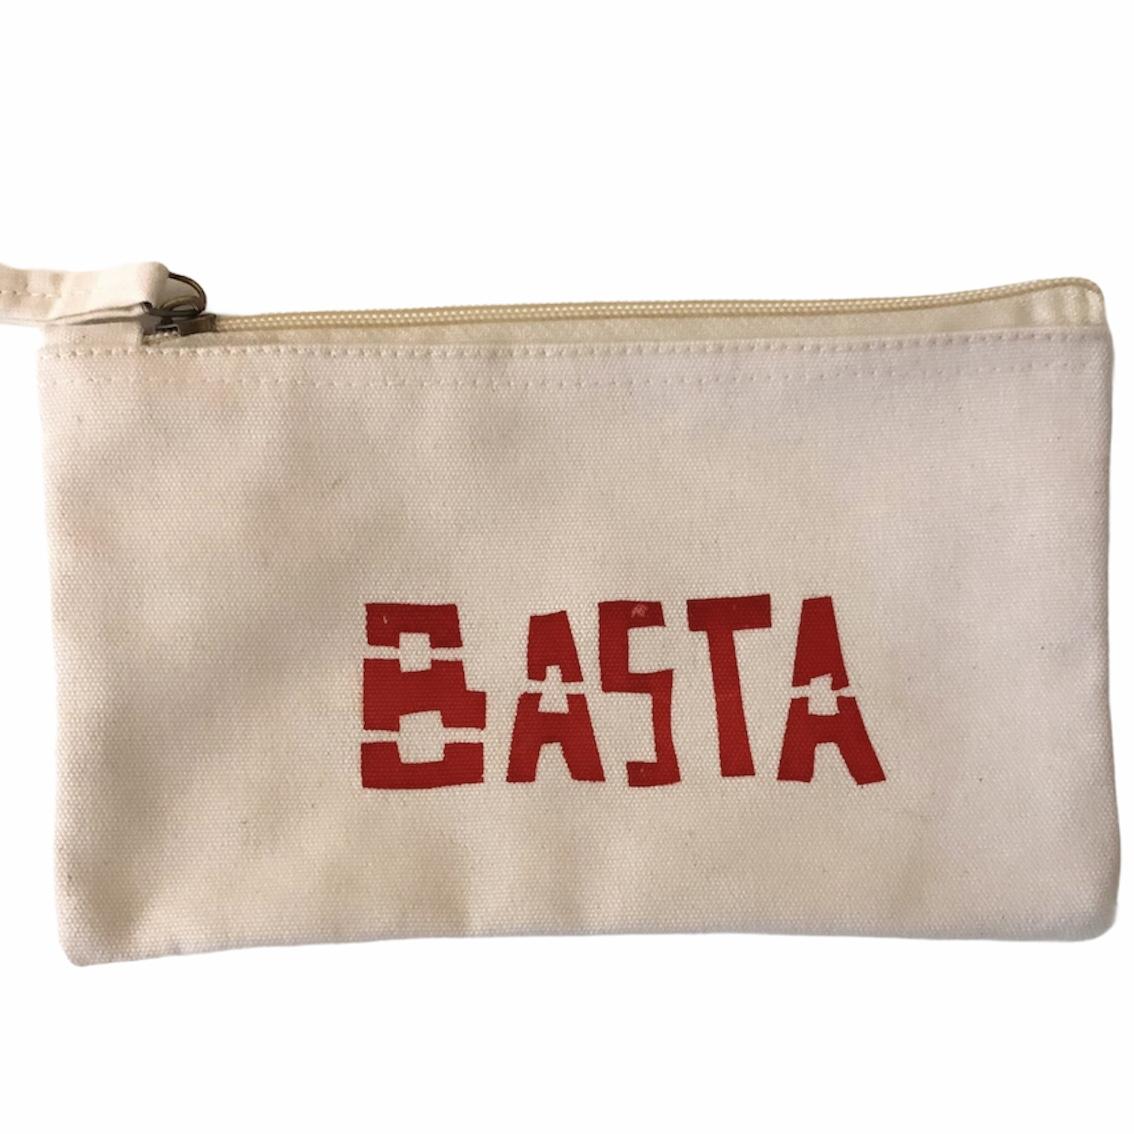 BASTA